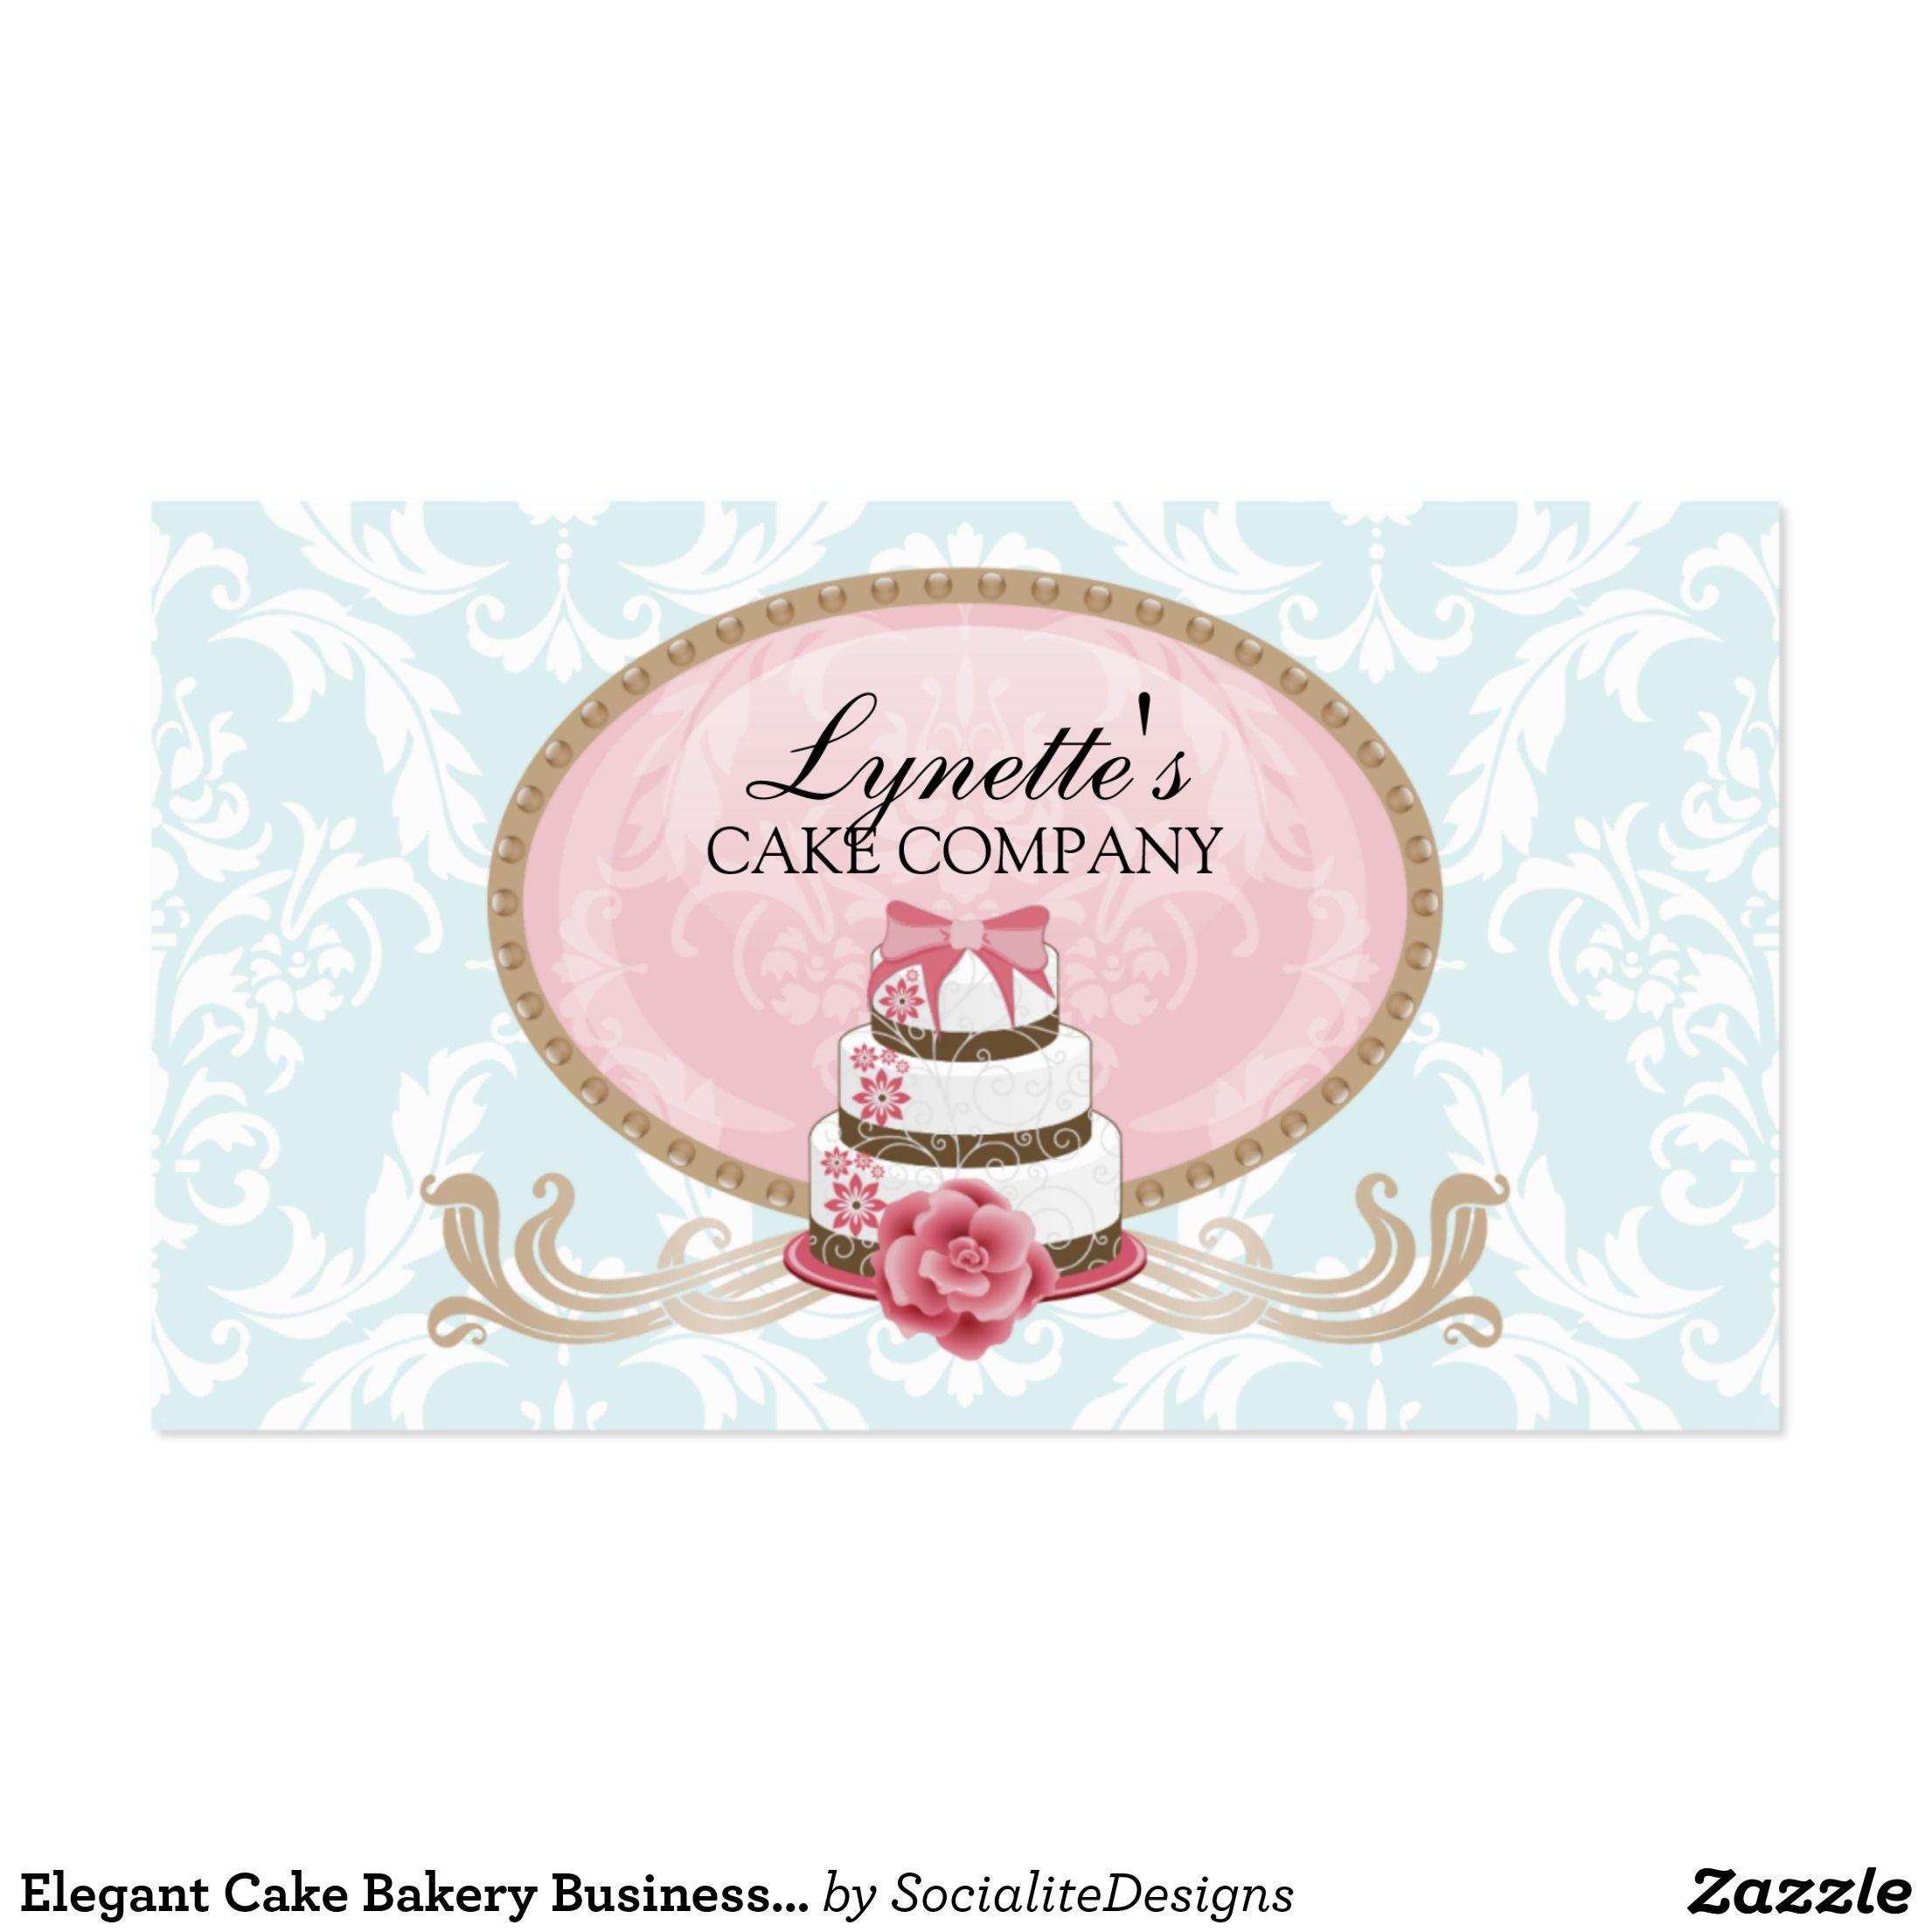 Elegant Cake Bakery Business Card | Bakery business cards, Bakery ...